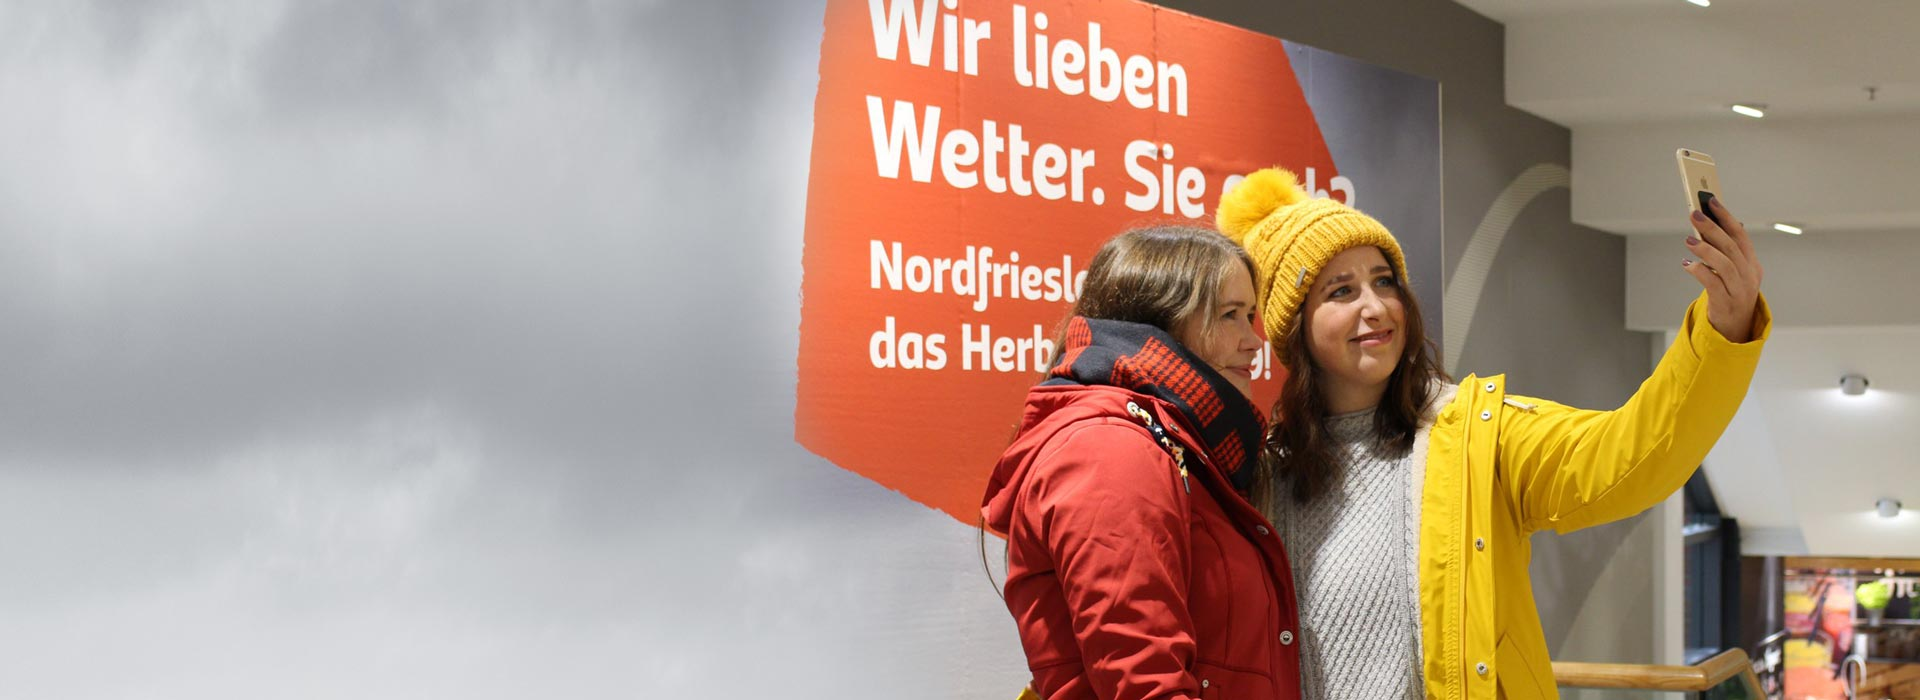 Moin Lieblingsland CJ Schmidt Aktion